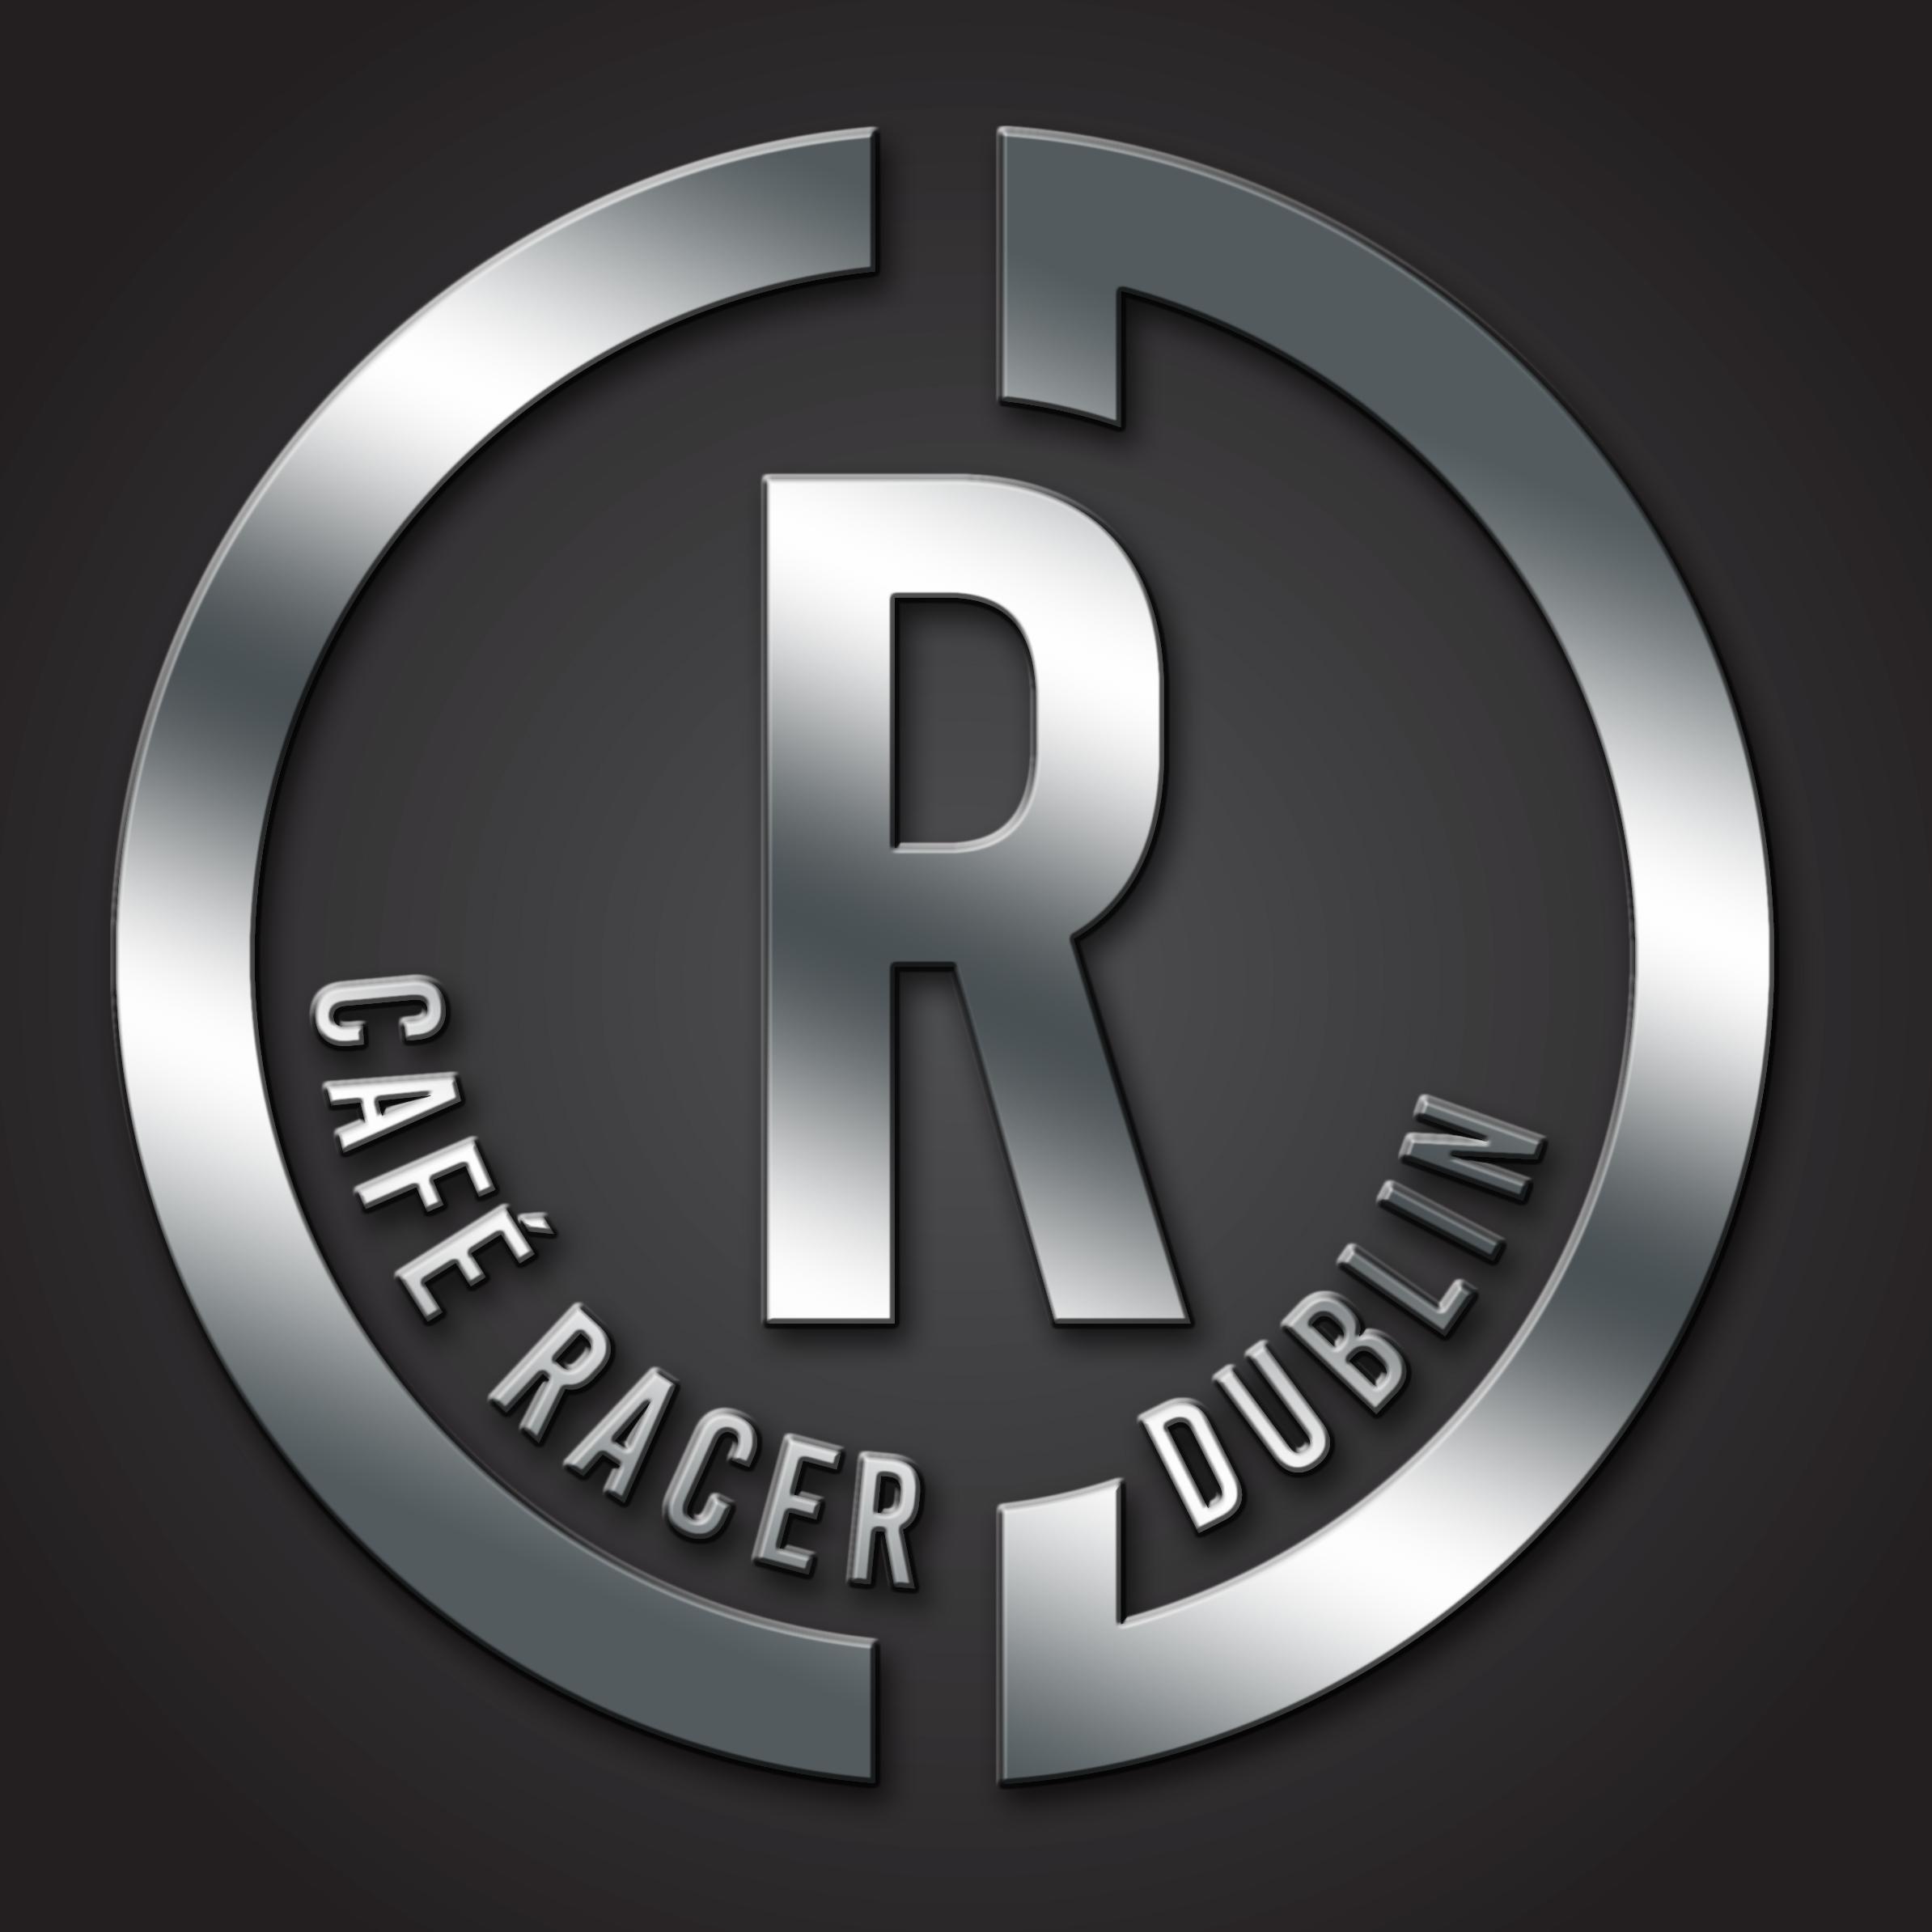 Cafe Racer Dublin 3D logo